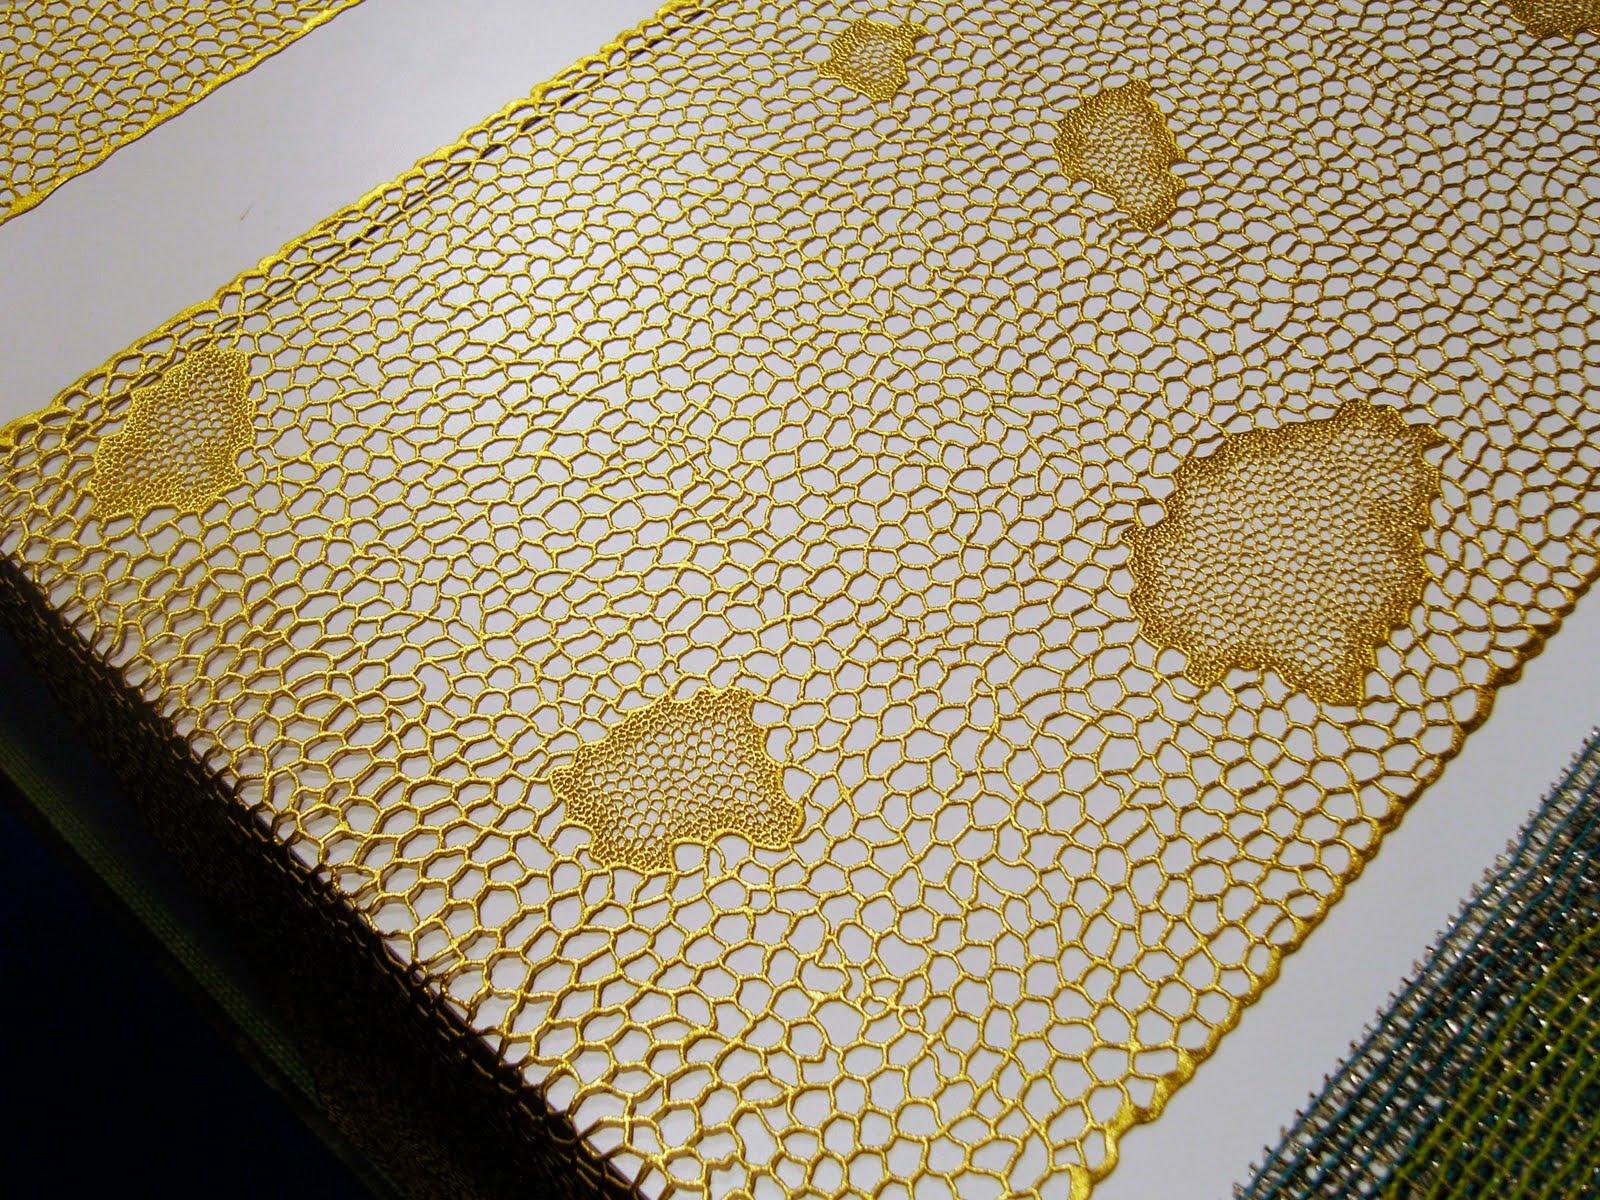 Destination Recession Honeycomb Patterns